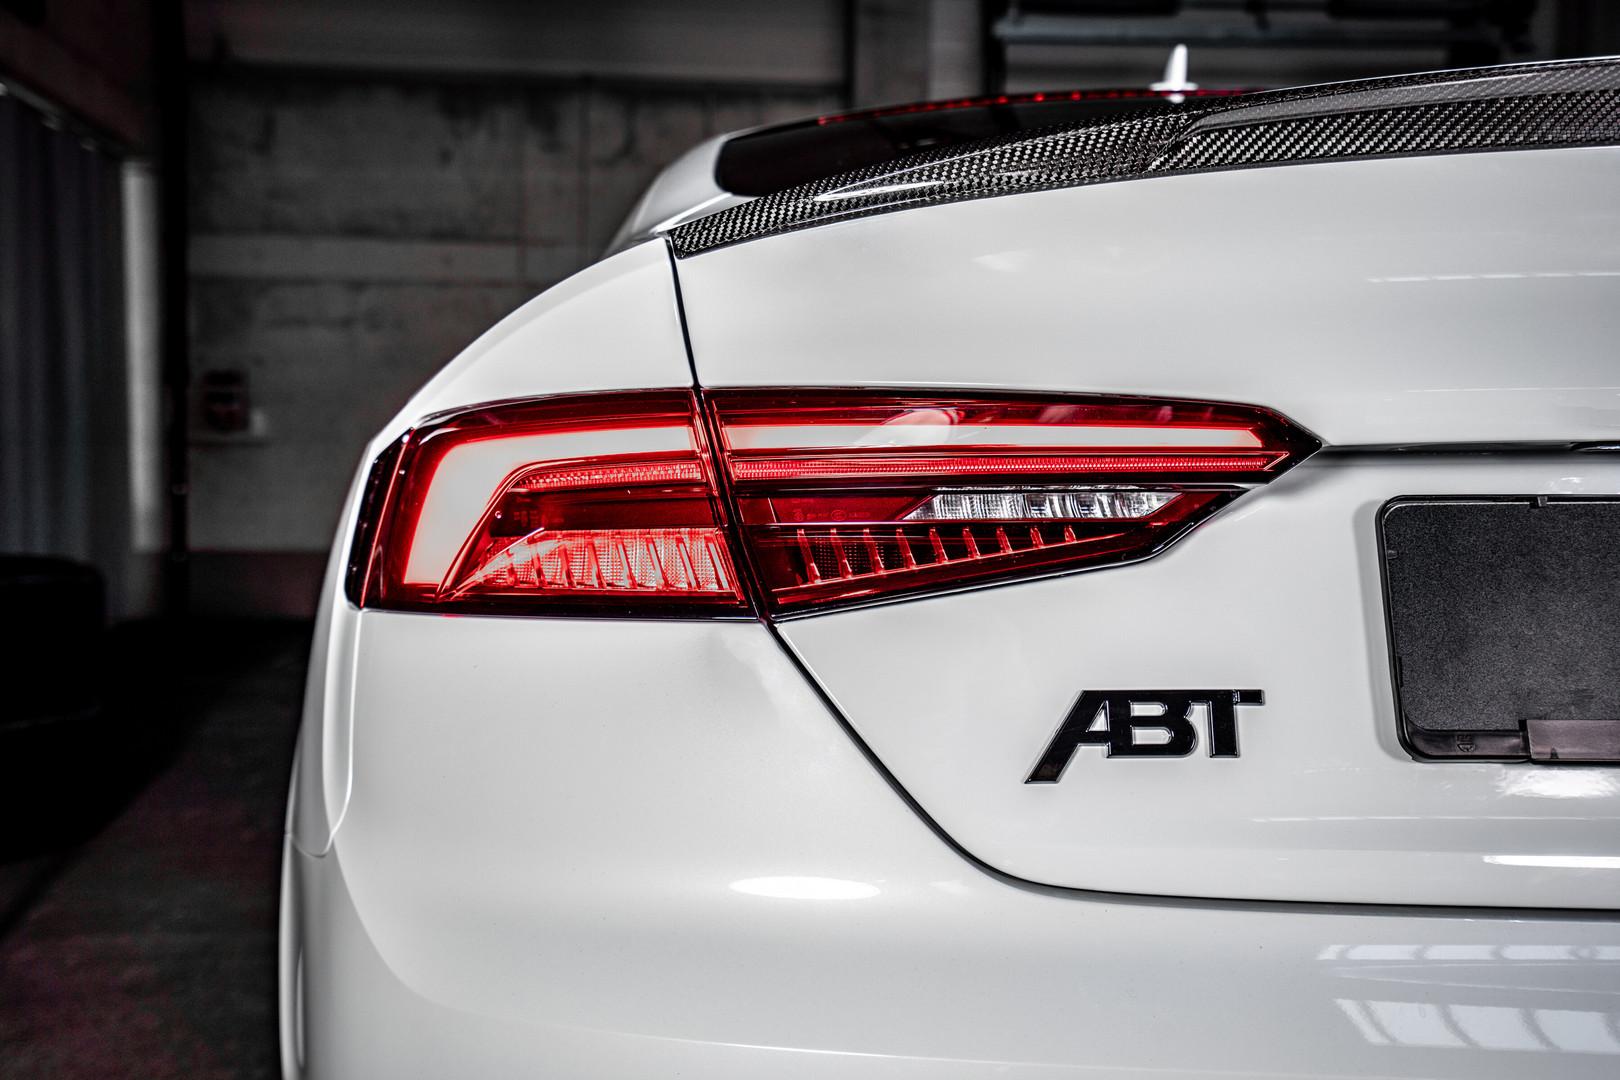 ABT Audi RS5-R Rear Light